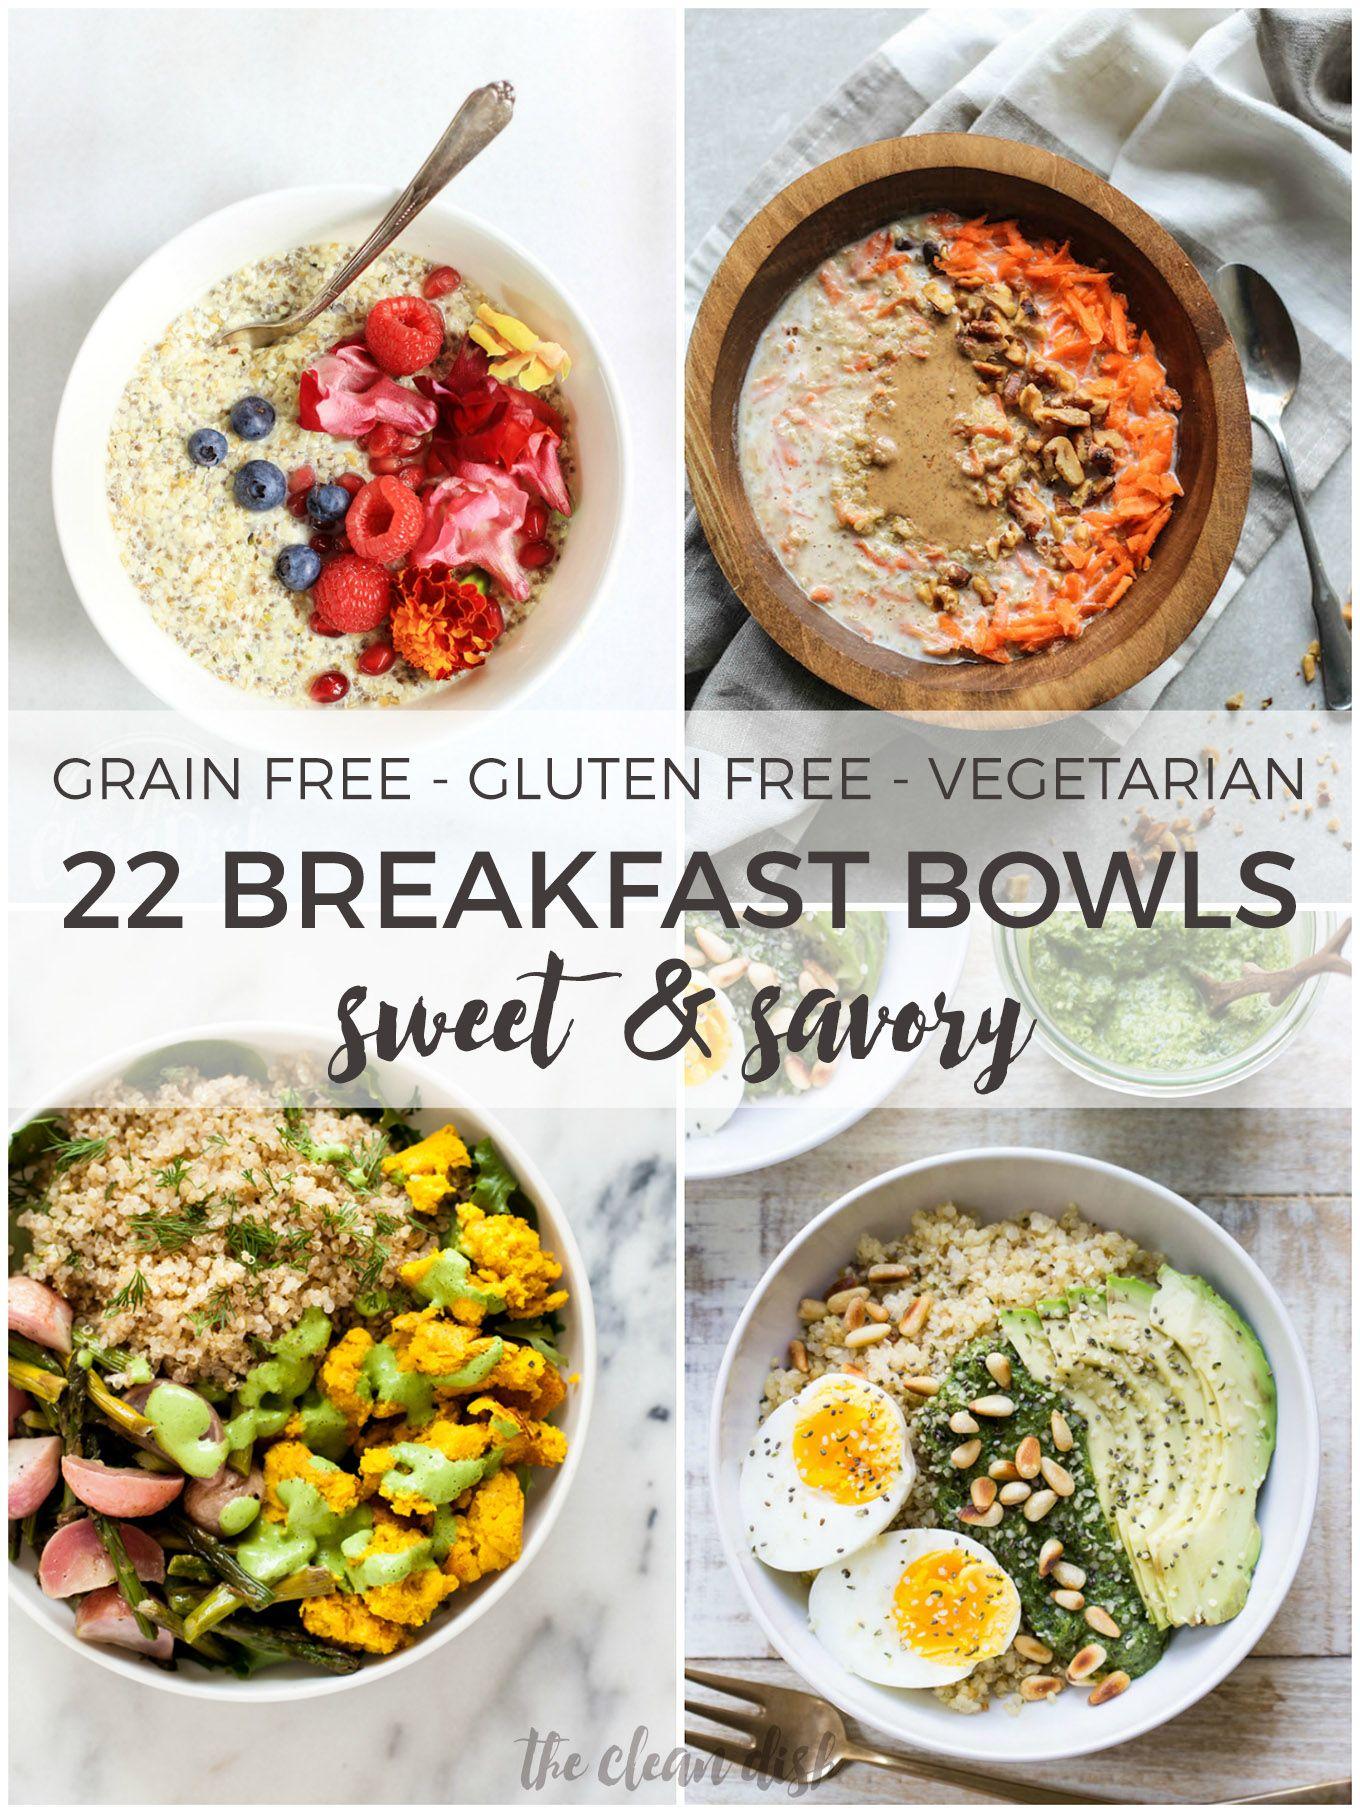 22 Sweet And Savory Breakfast Bowls Grain Free Gluten Free Vegetarian Breakfast Bowls Healthy Breakfast Recipes Grain Free Recipes